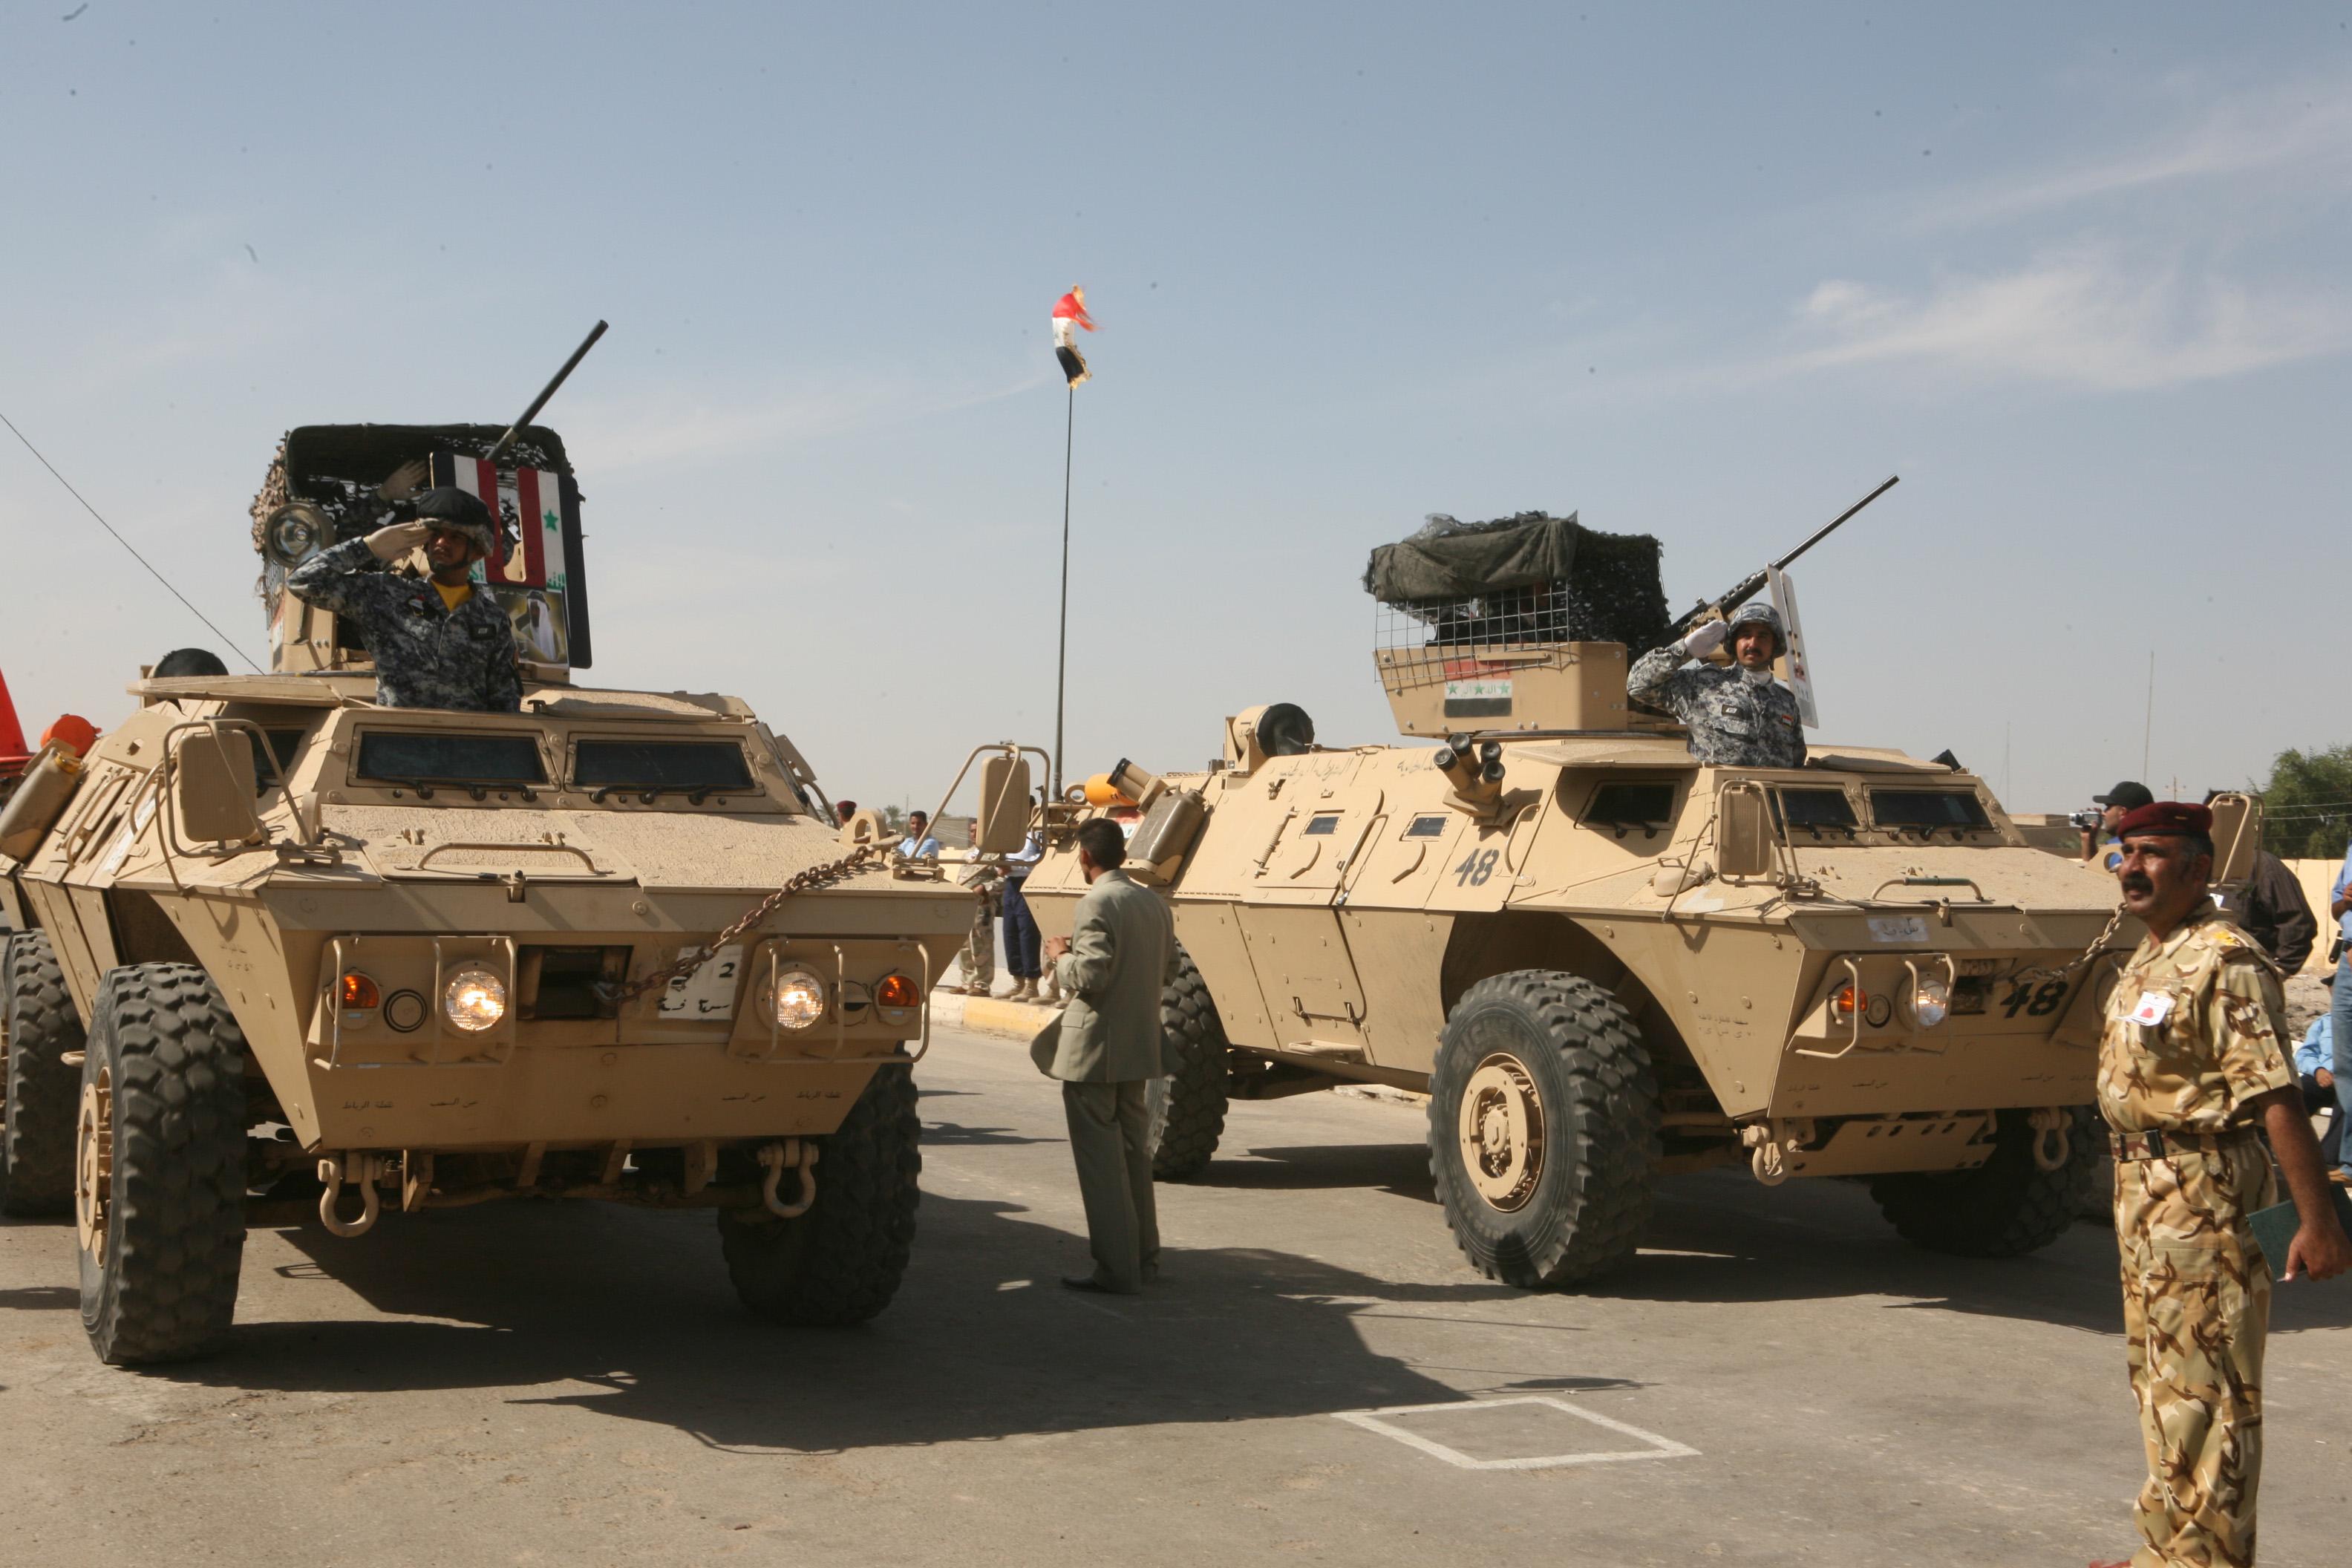 Humvee Kit Cars For Sale